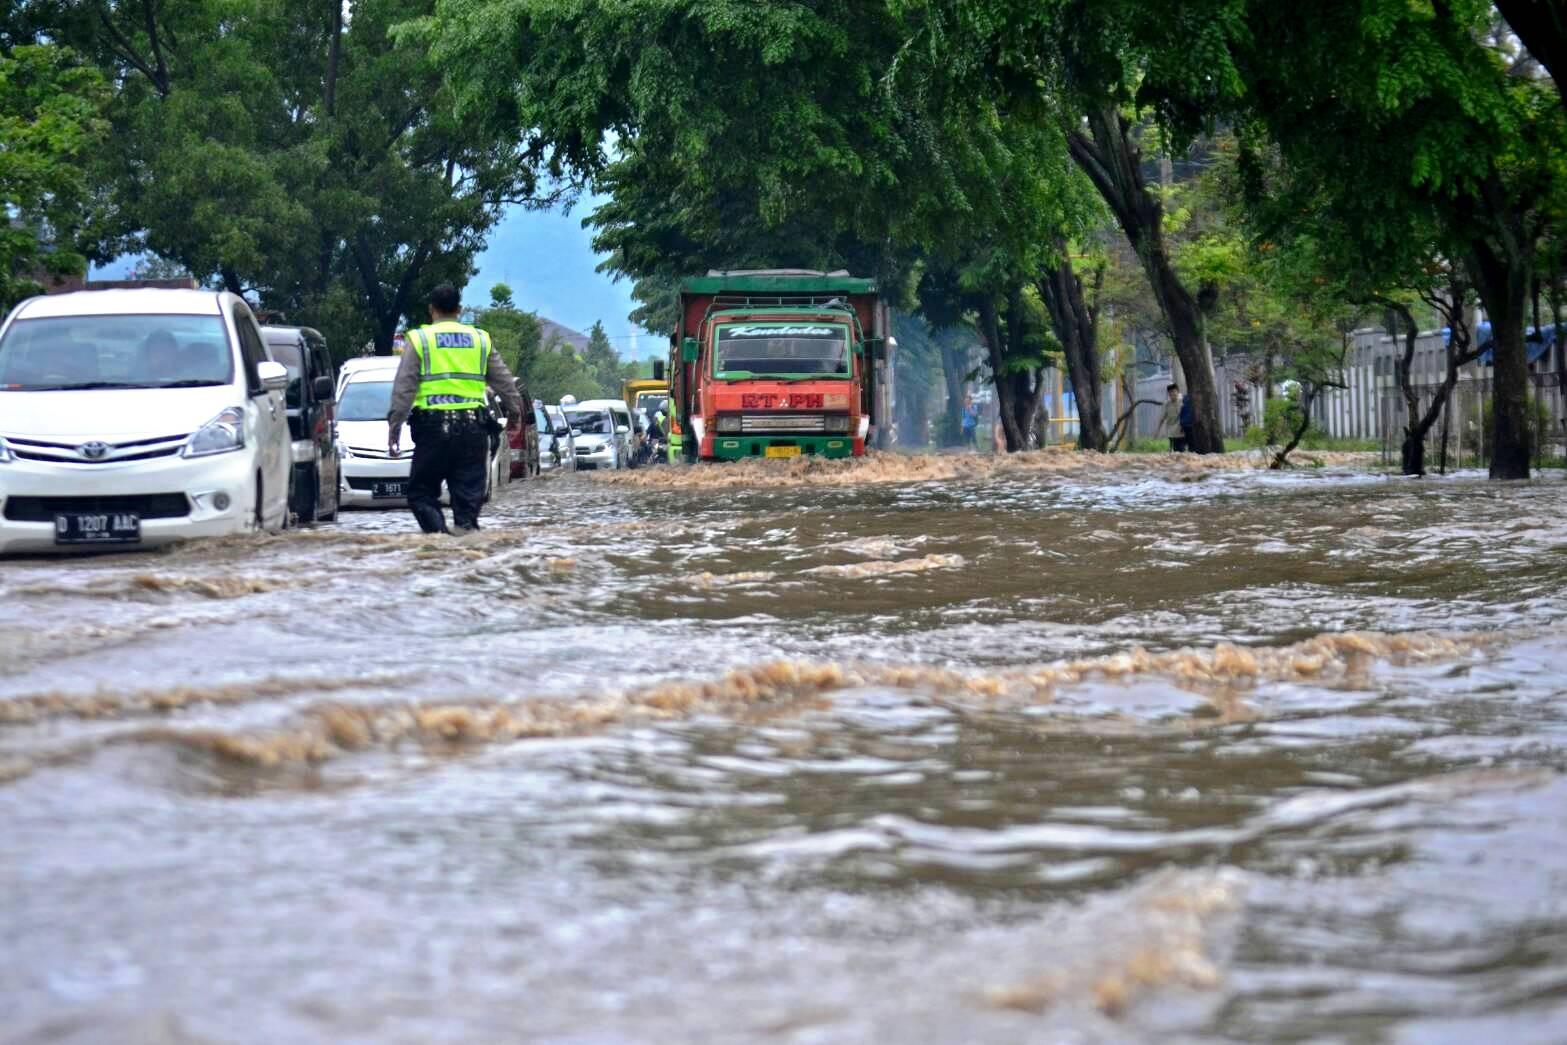 Kawasan Cekungan Bandung Makin Banjir Mongabay Id Kendaraan Menerobos Genangan